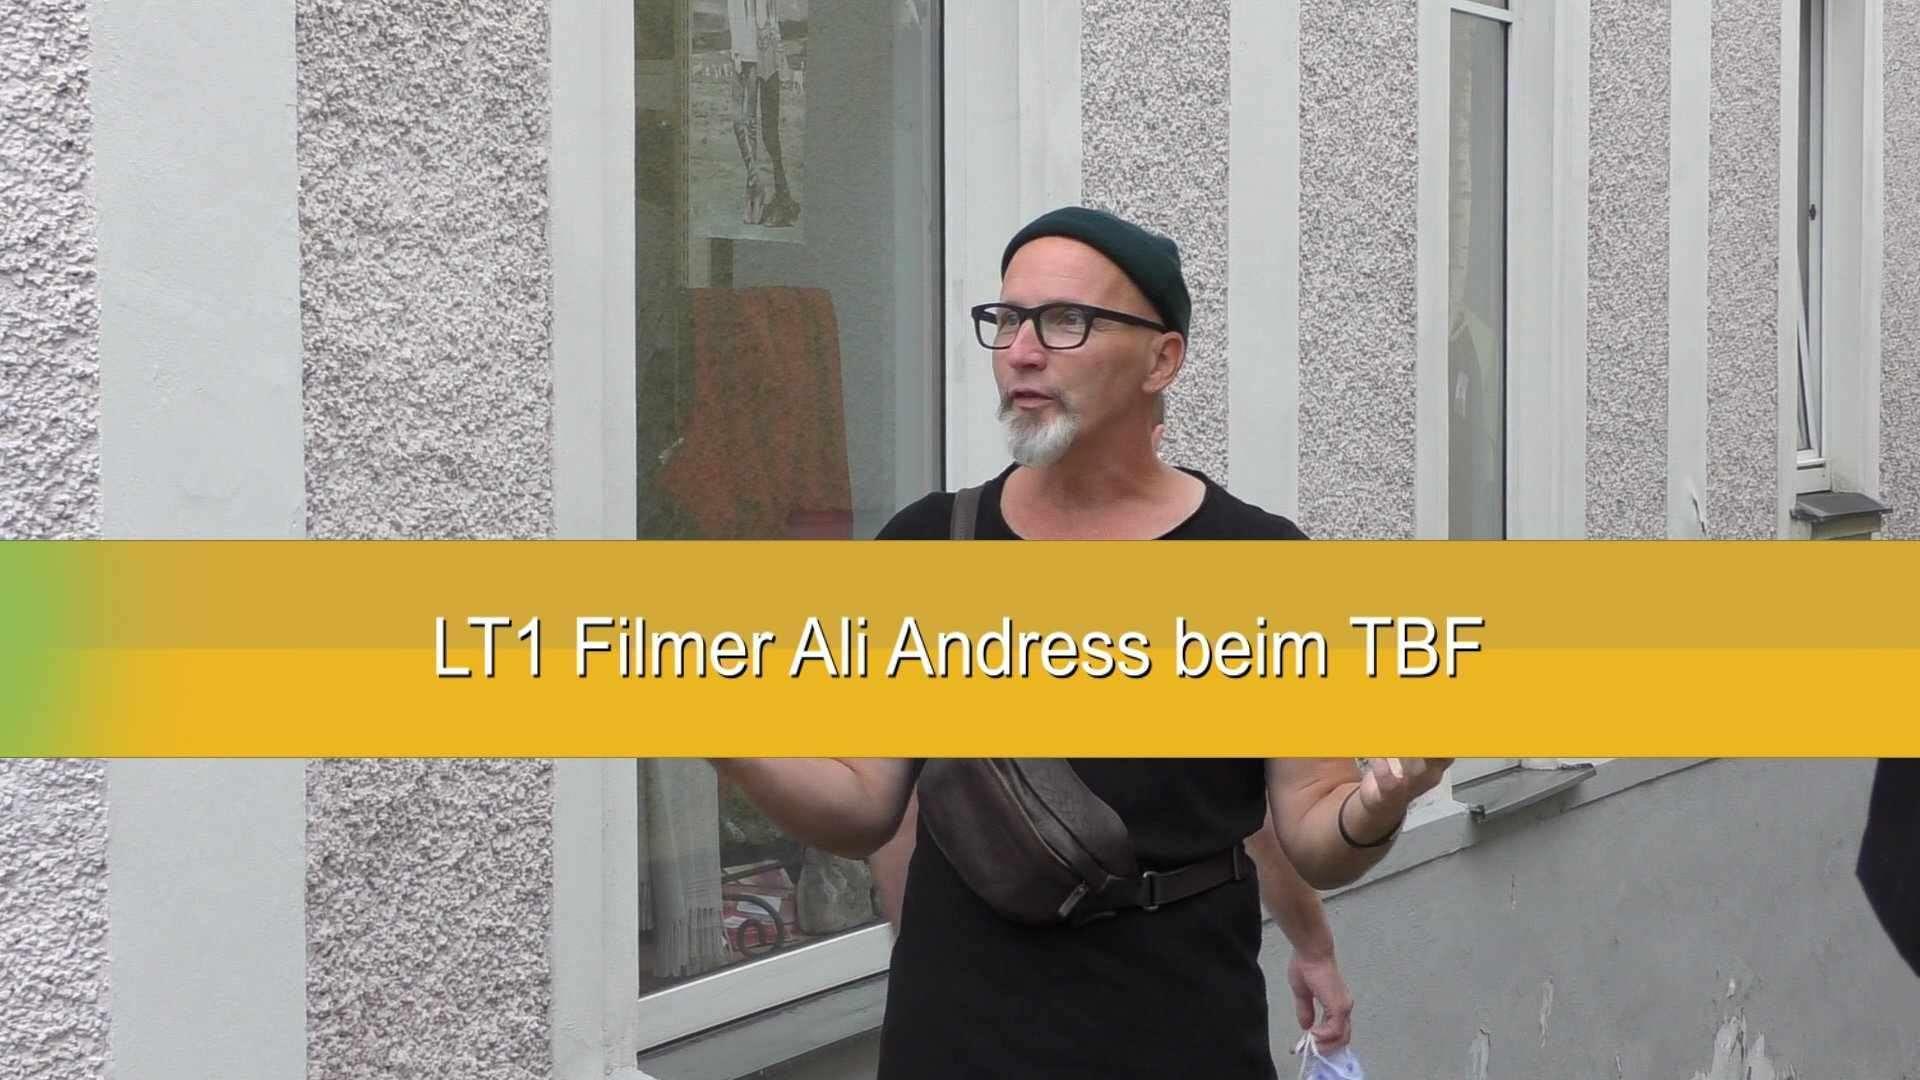 LT1 Filmer Ali Andress, beim TBF